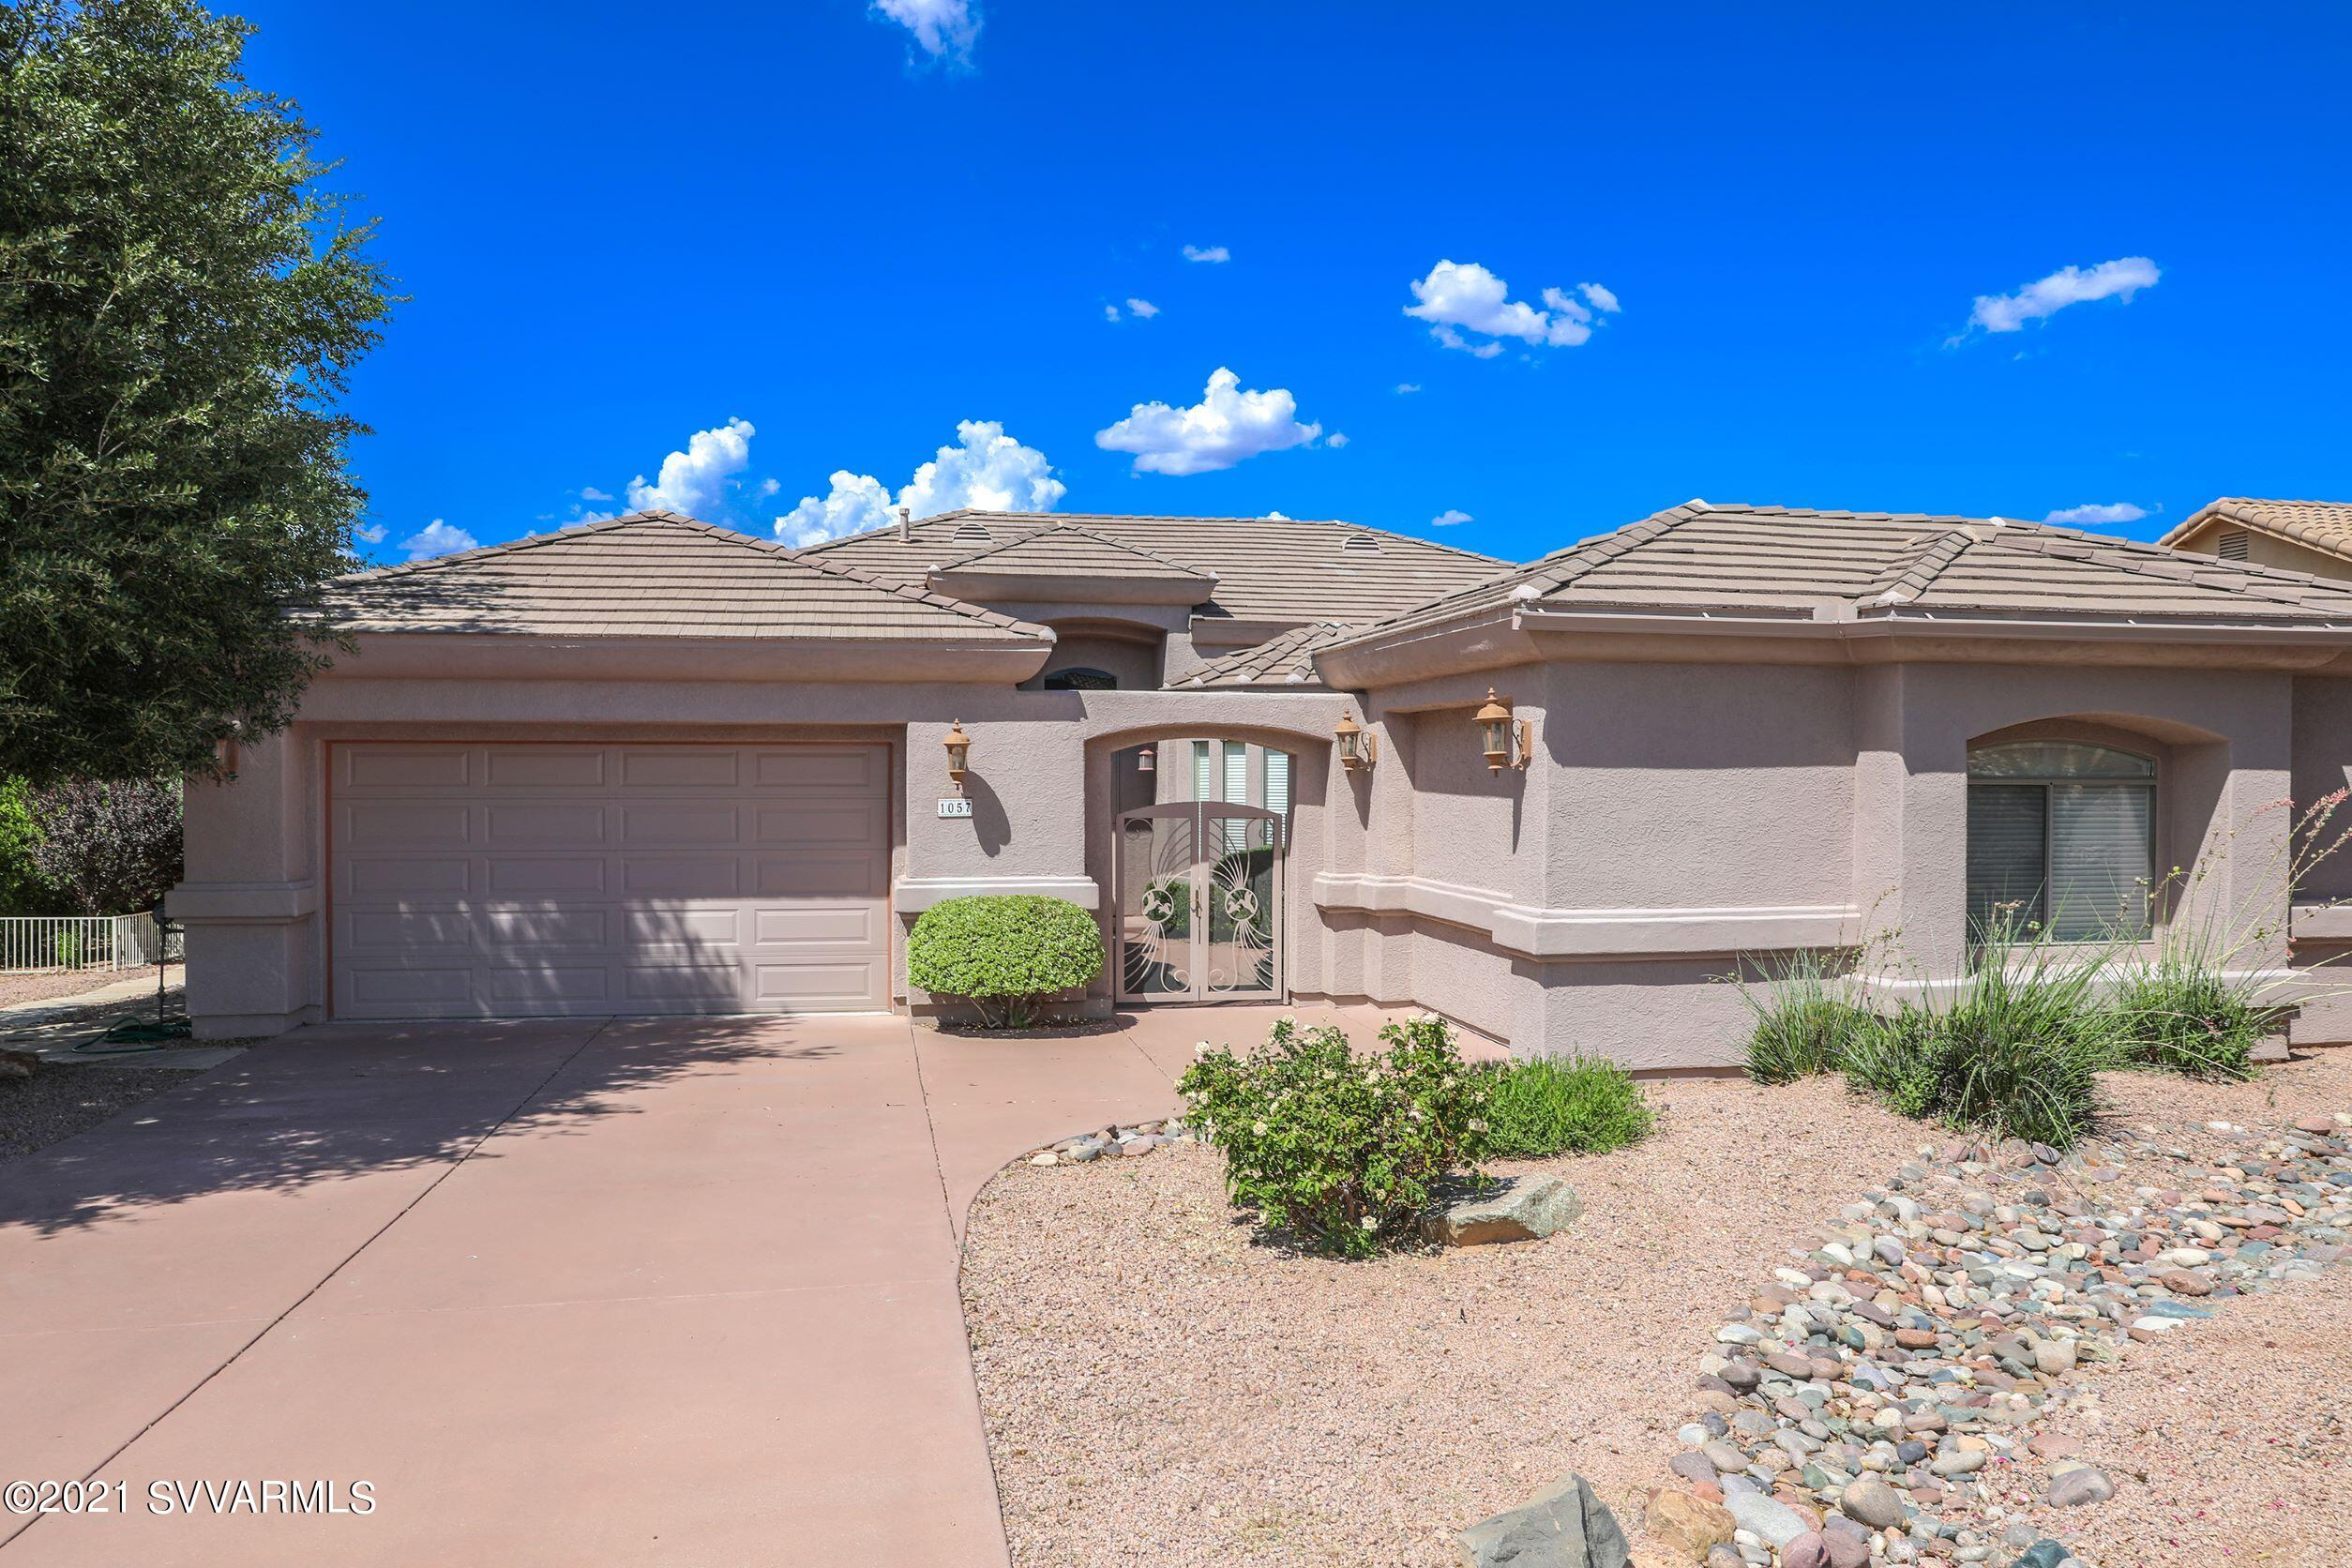 Photo of 1057 Verde Santa Fe Pkwy, Cornville, AZ 86325